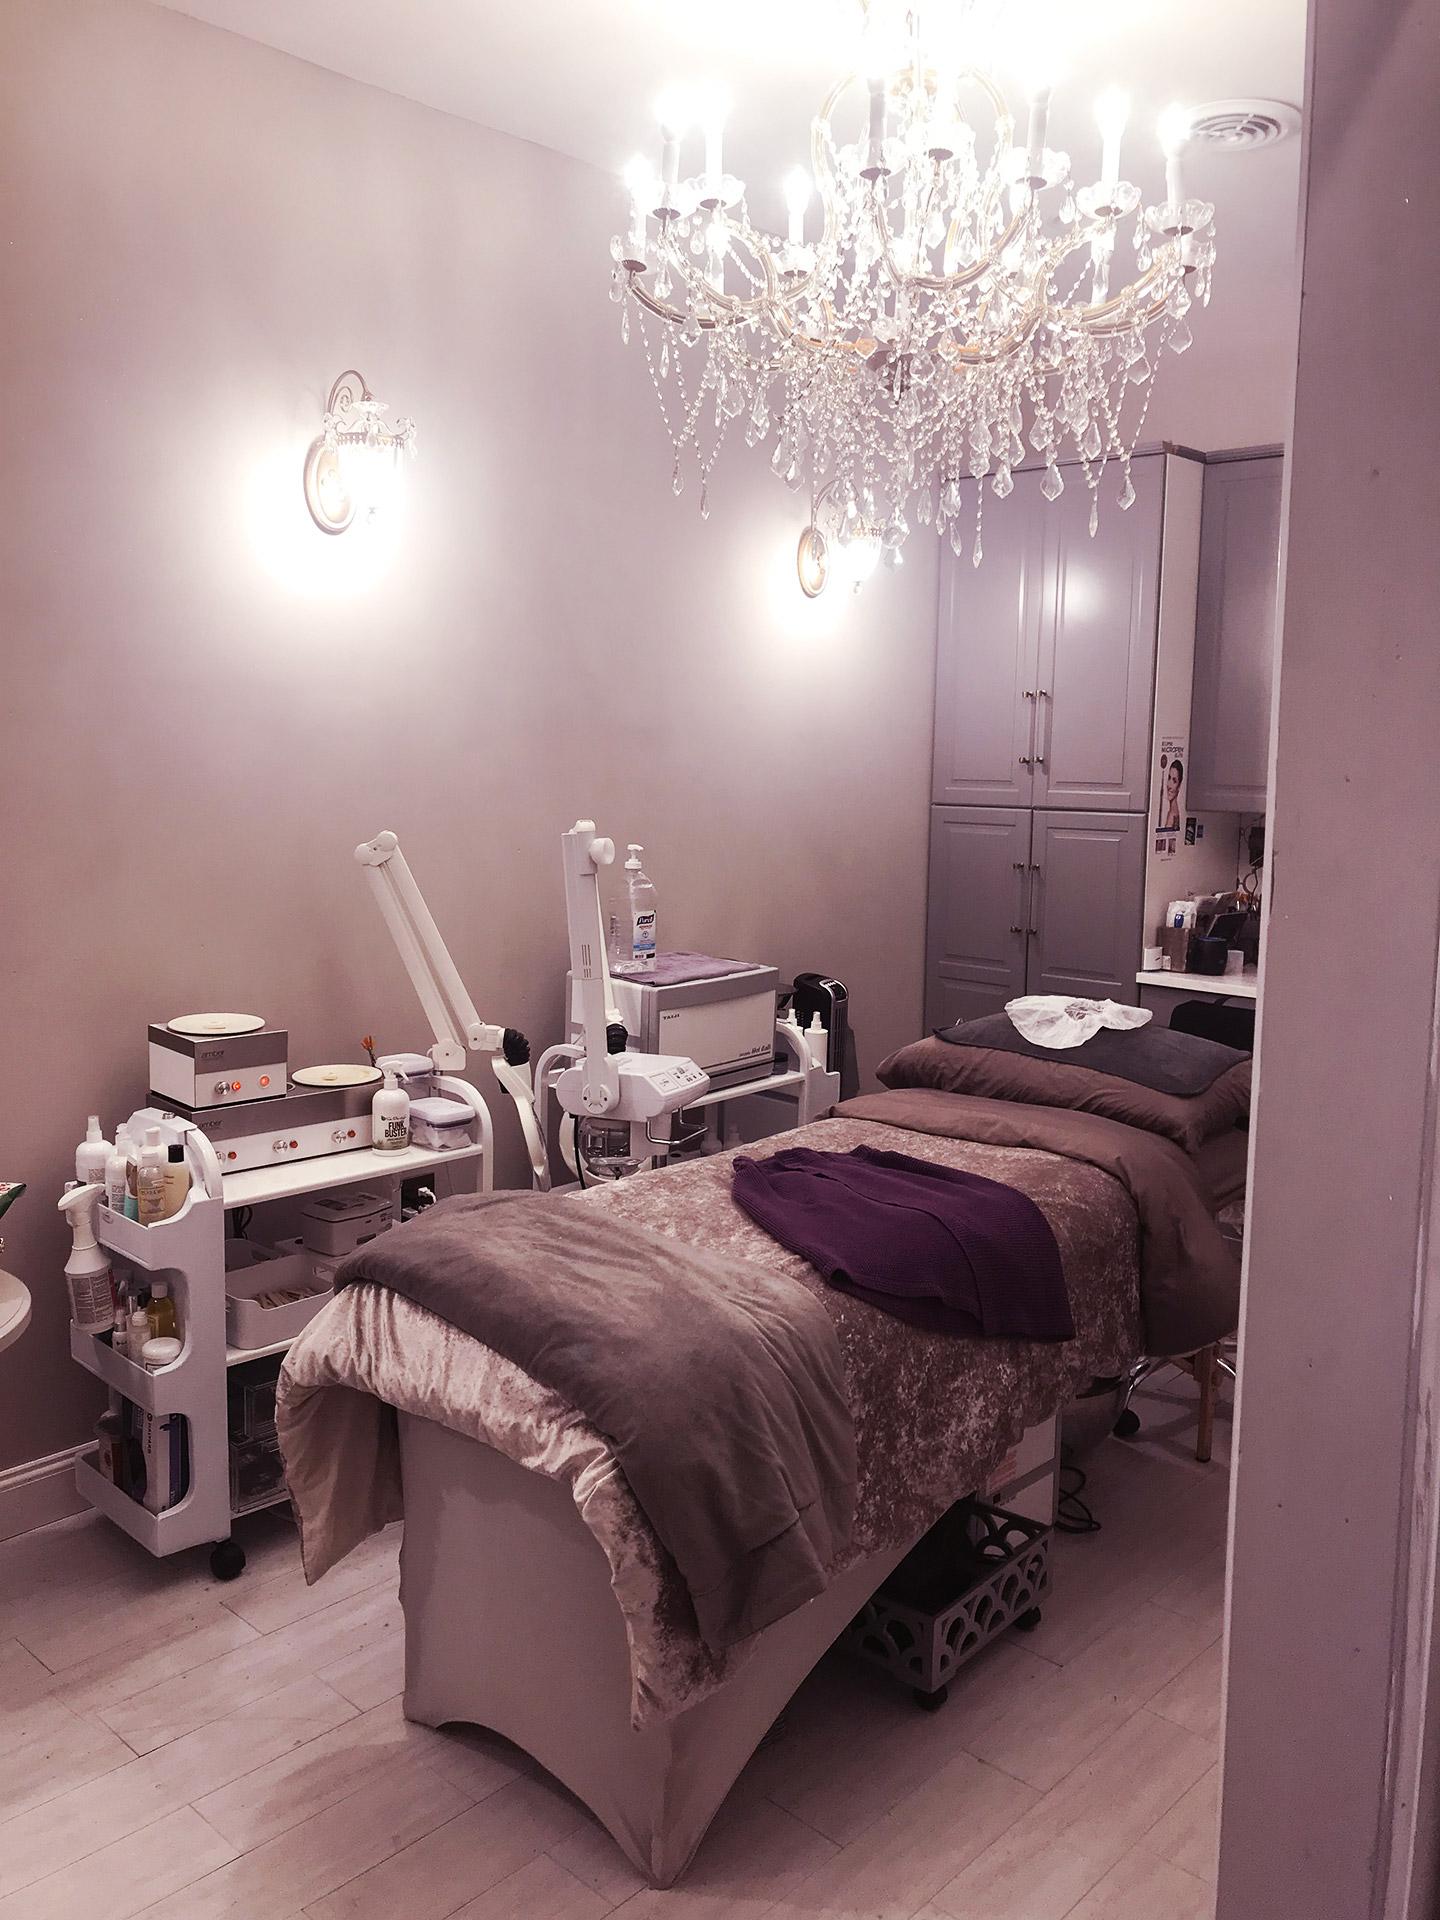 Cynthia Aesthetics Shop Interior2_Cynthia Aesthetics_Brooklyn, NYC Skincare, Hair Removal and Eyebrow Clinic